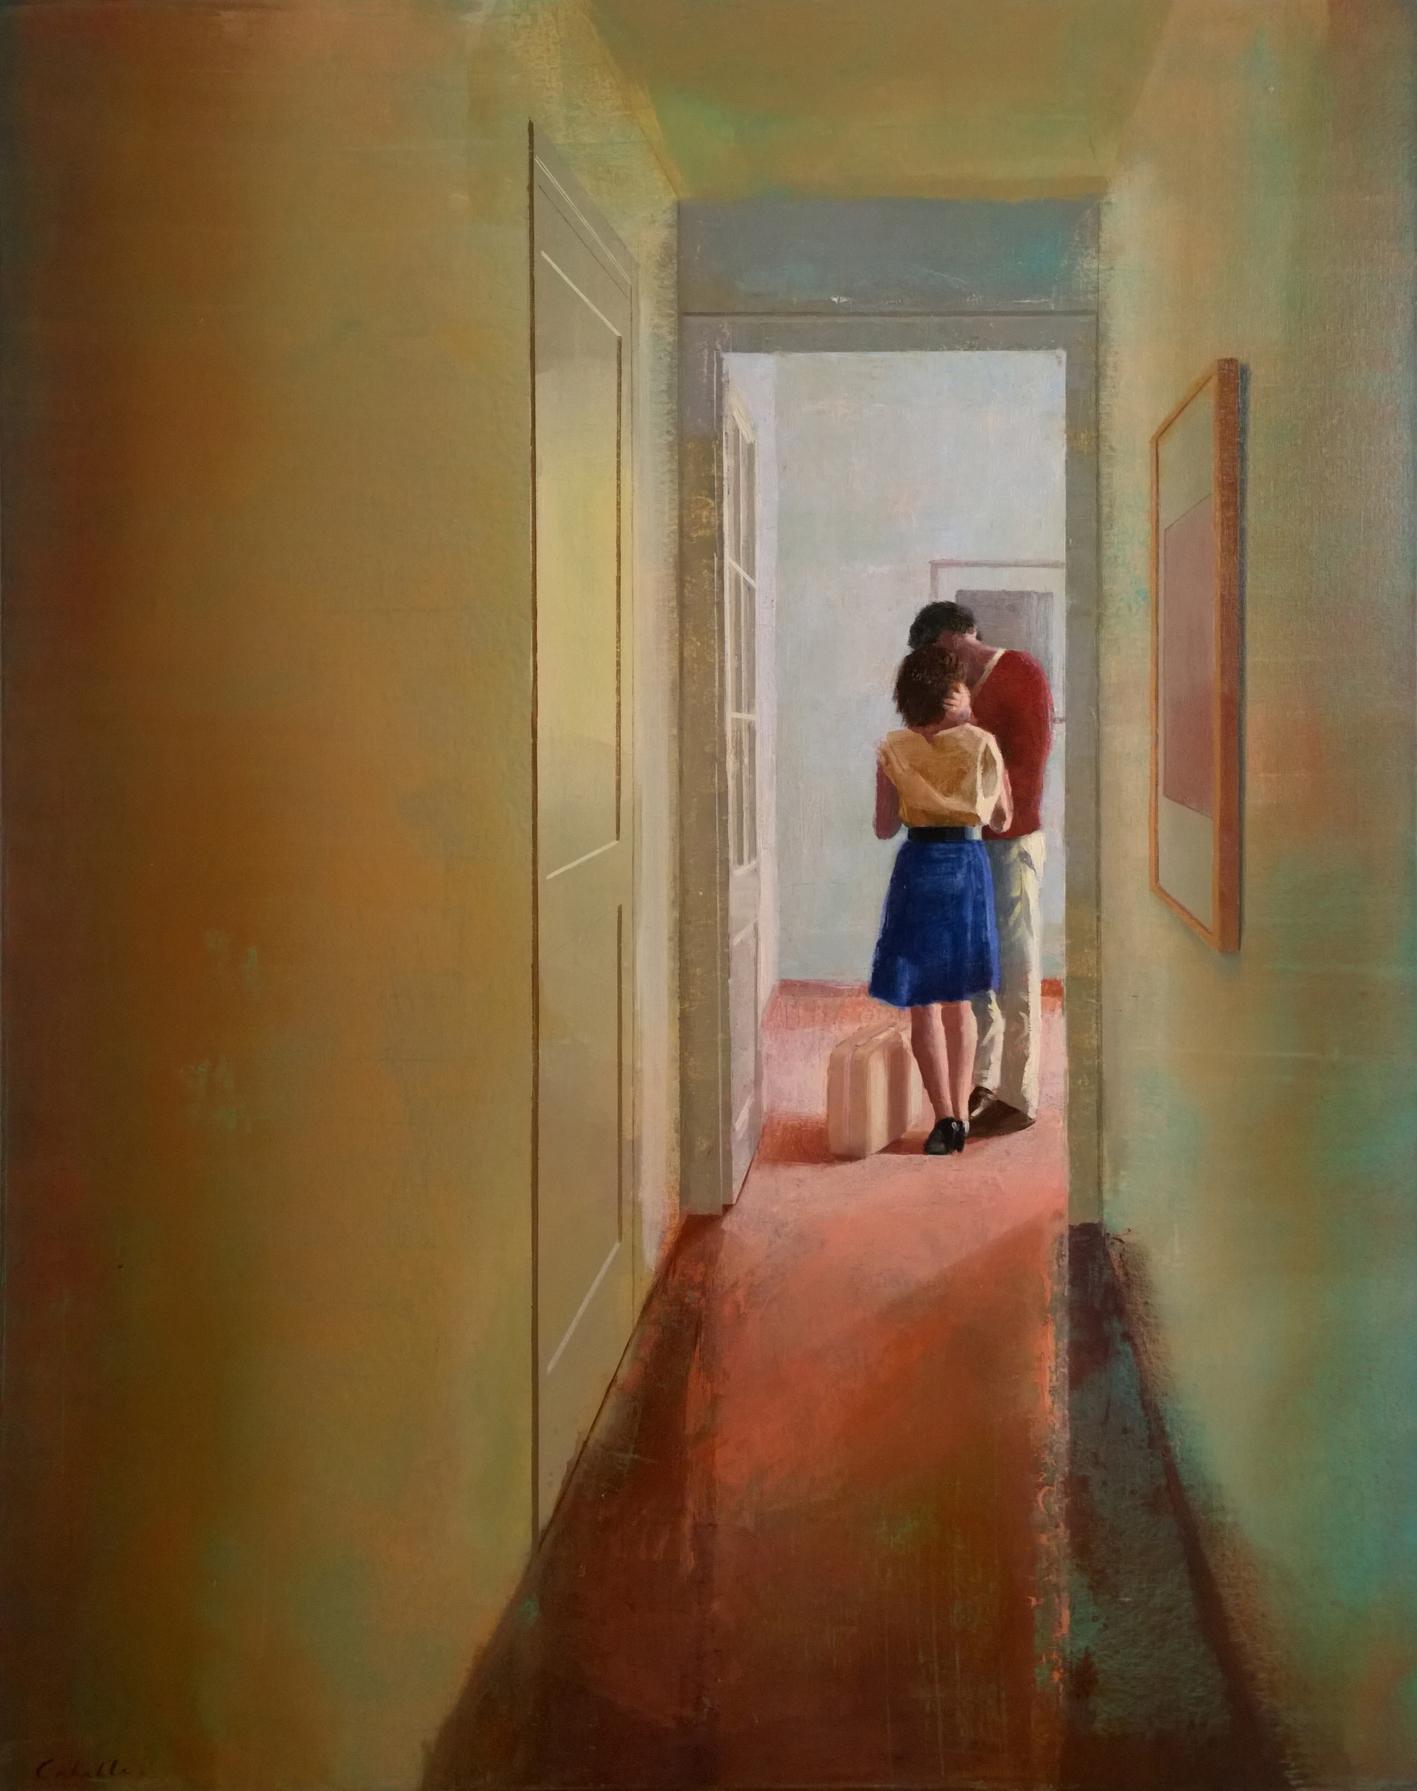 bienvenida-alejandra-caballero-oleo-interior-pasillo-pareja-enamorados-beso